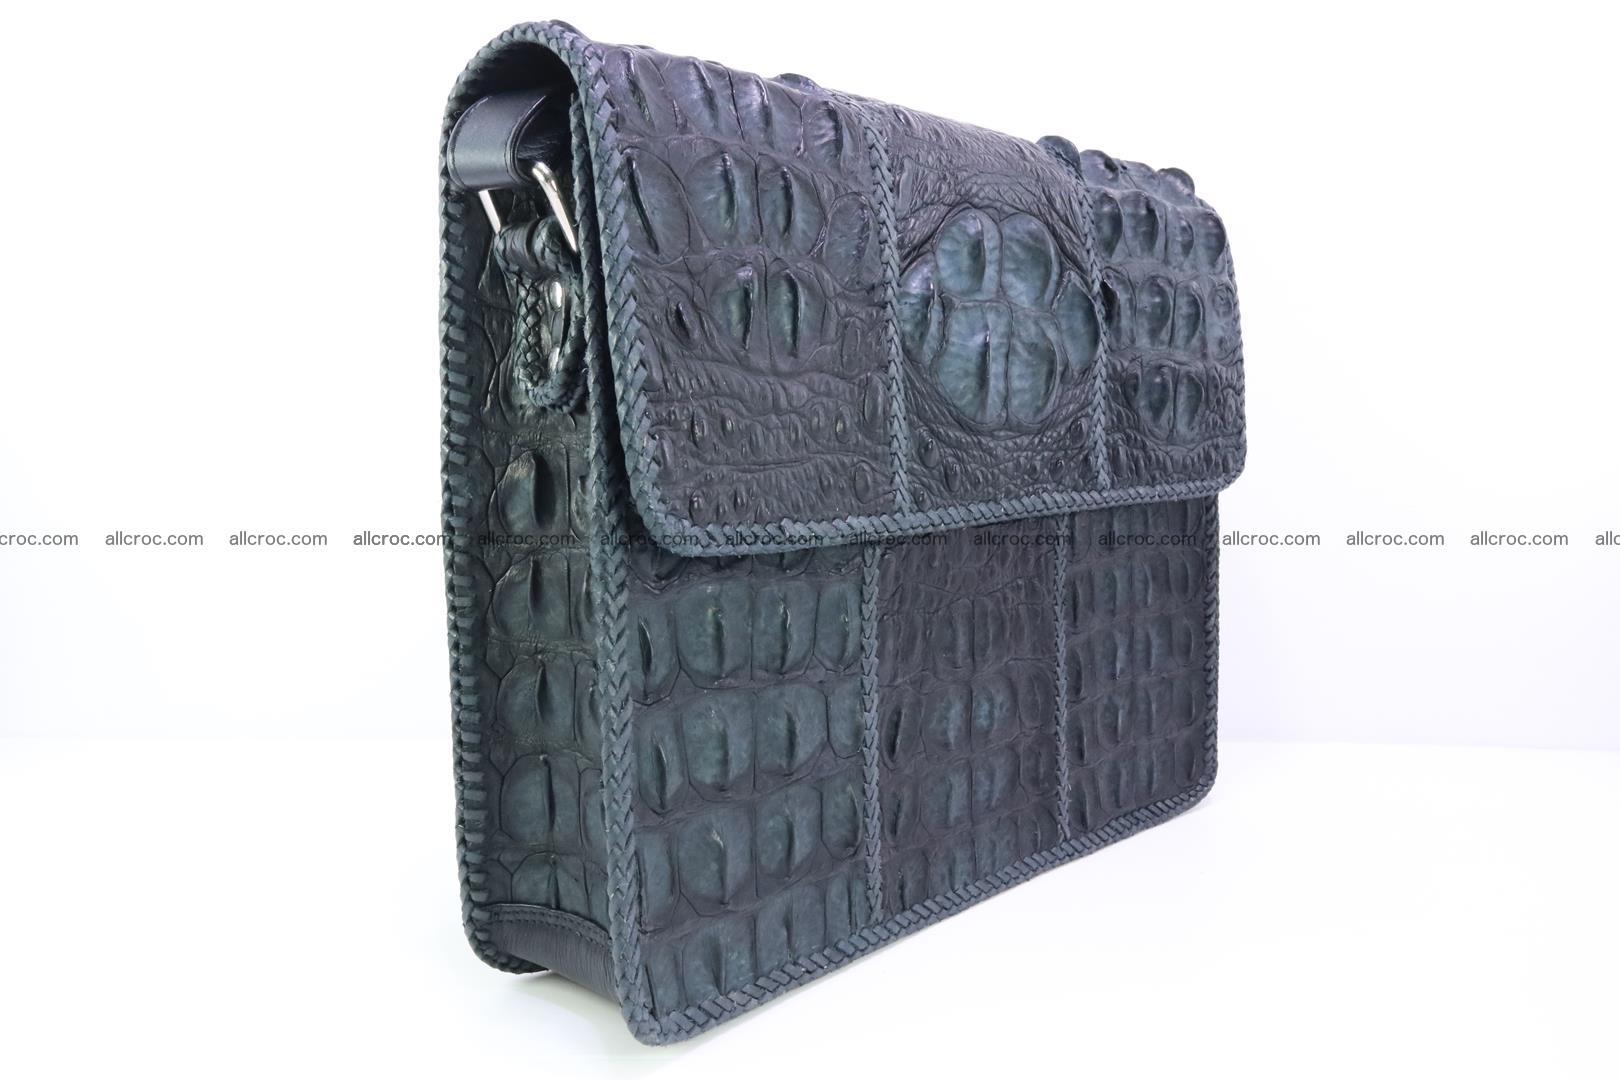 Crocodile skin shoulder bag with braided edges 146 Foto 2